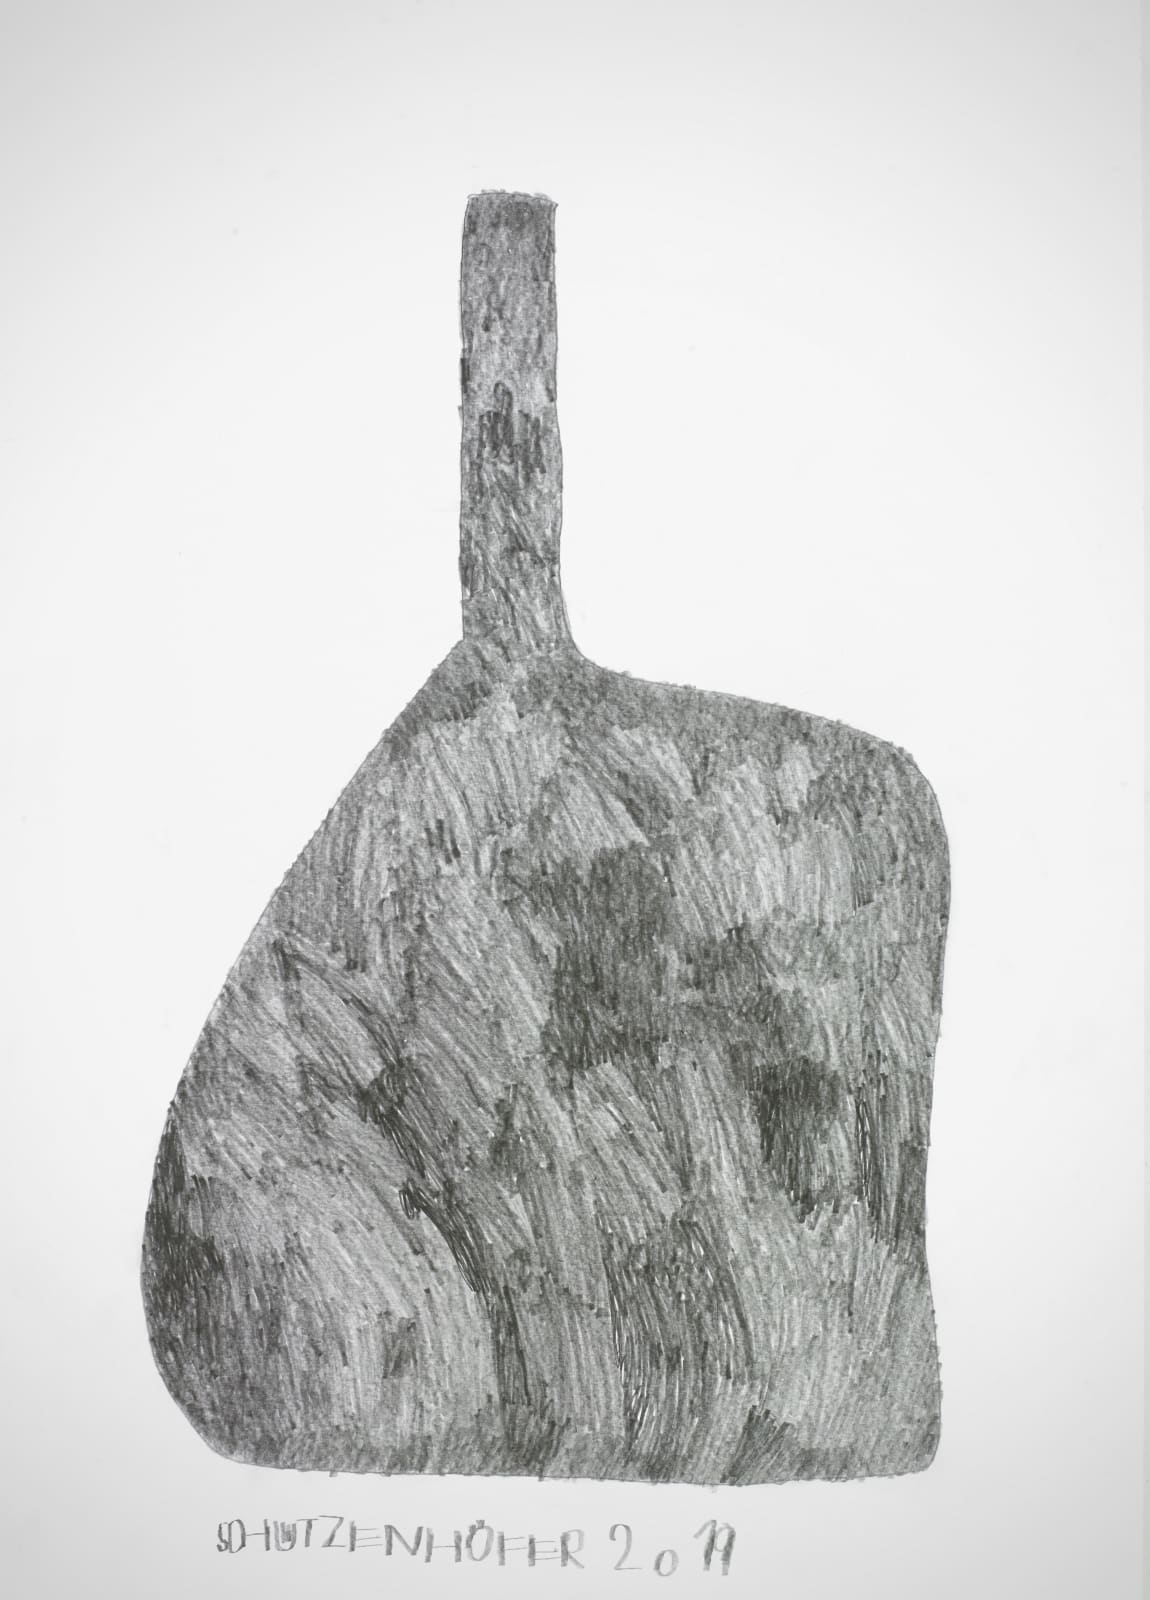 Bottle, 2019 Graphite on paper 27.6 x 19.7 x in. (70.1 x 50 cm.) (GSG 120) $7,000